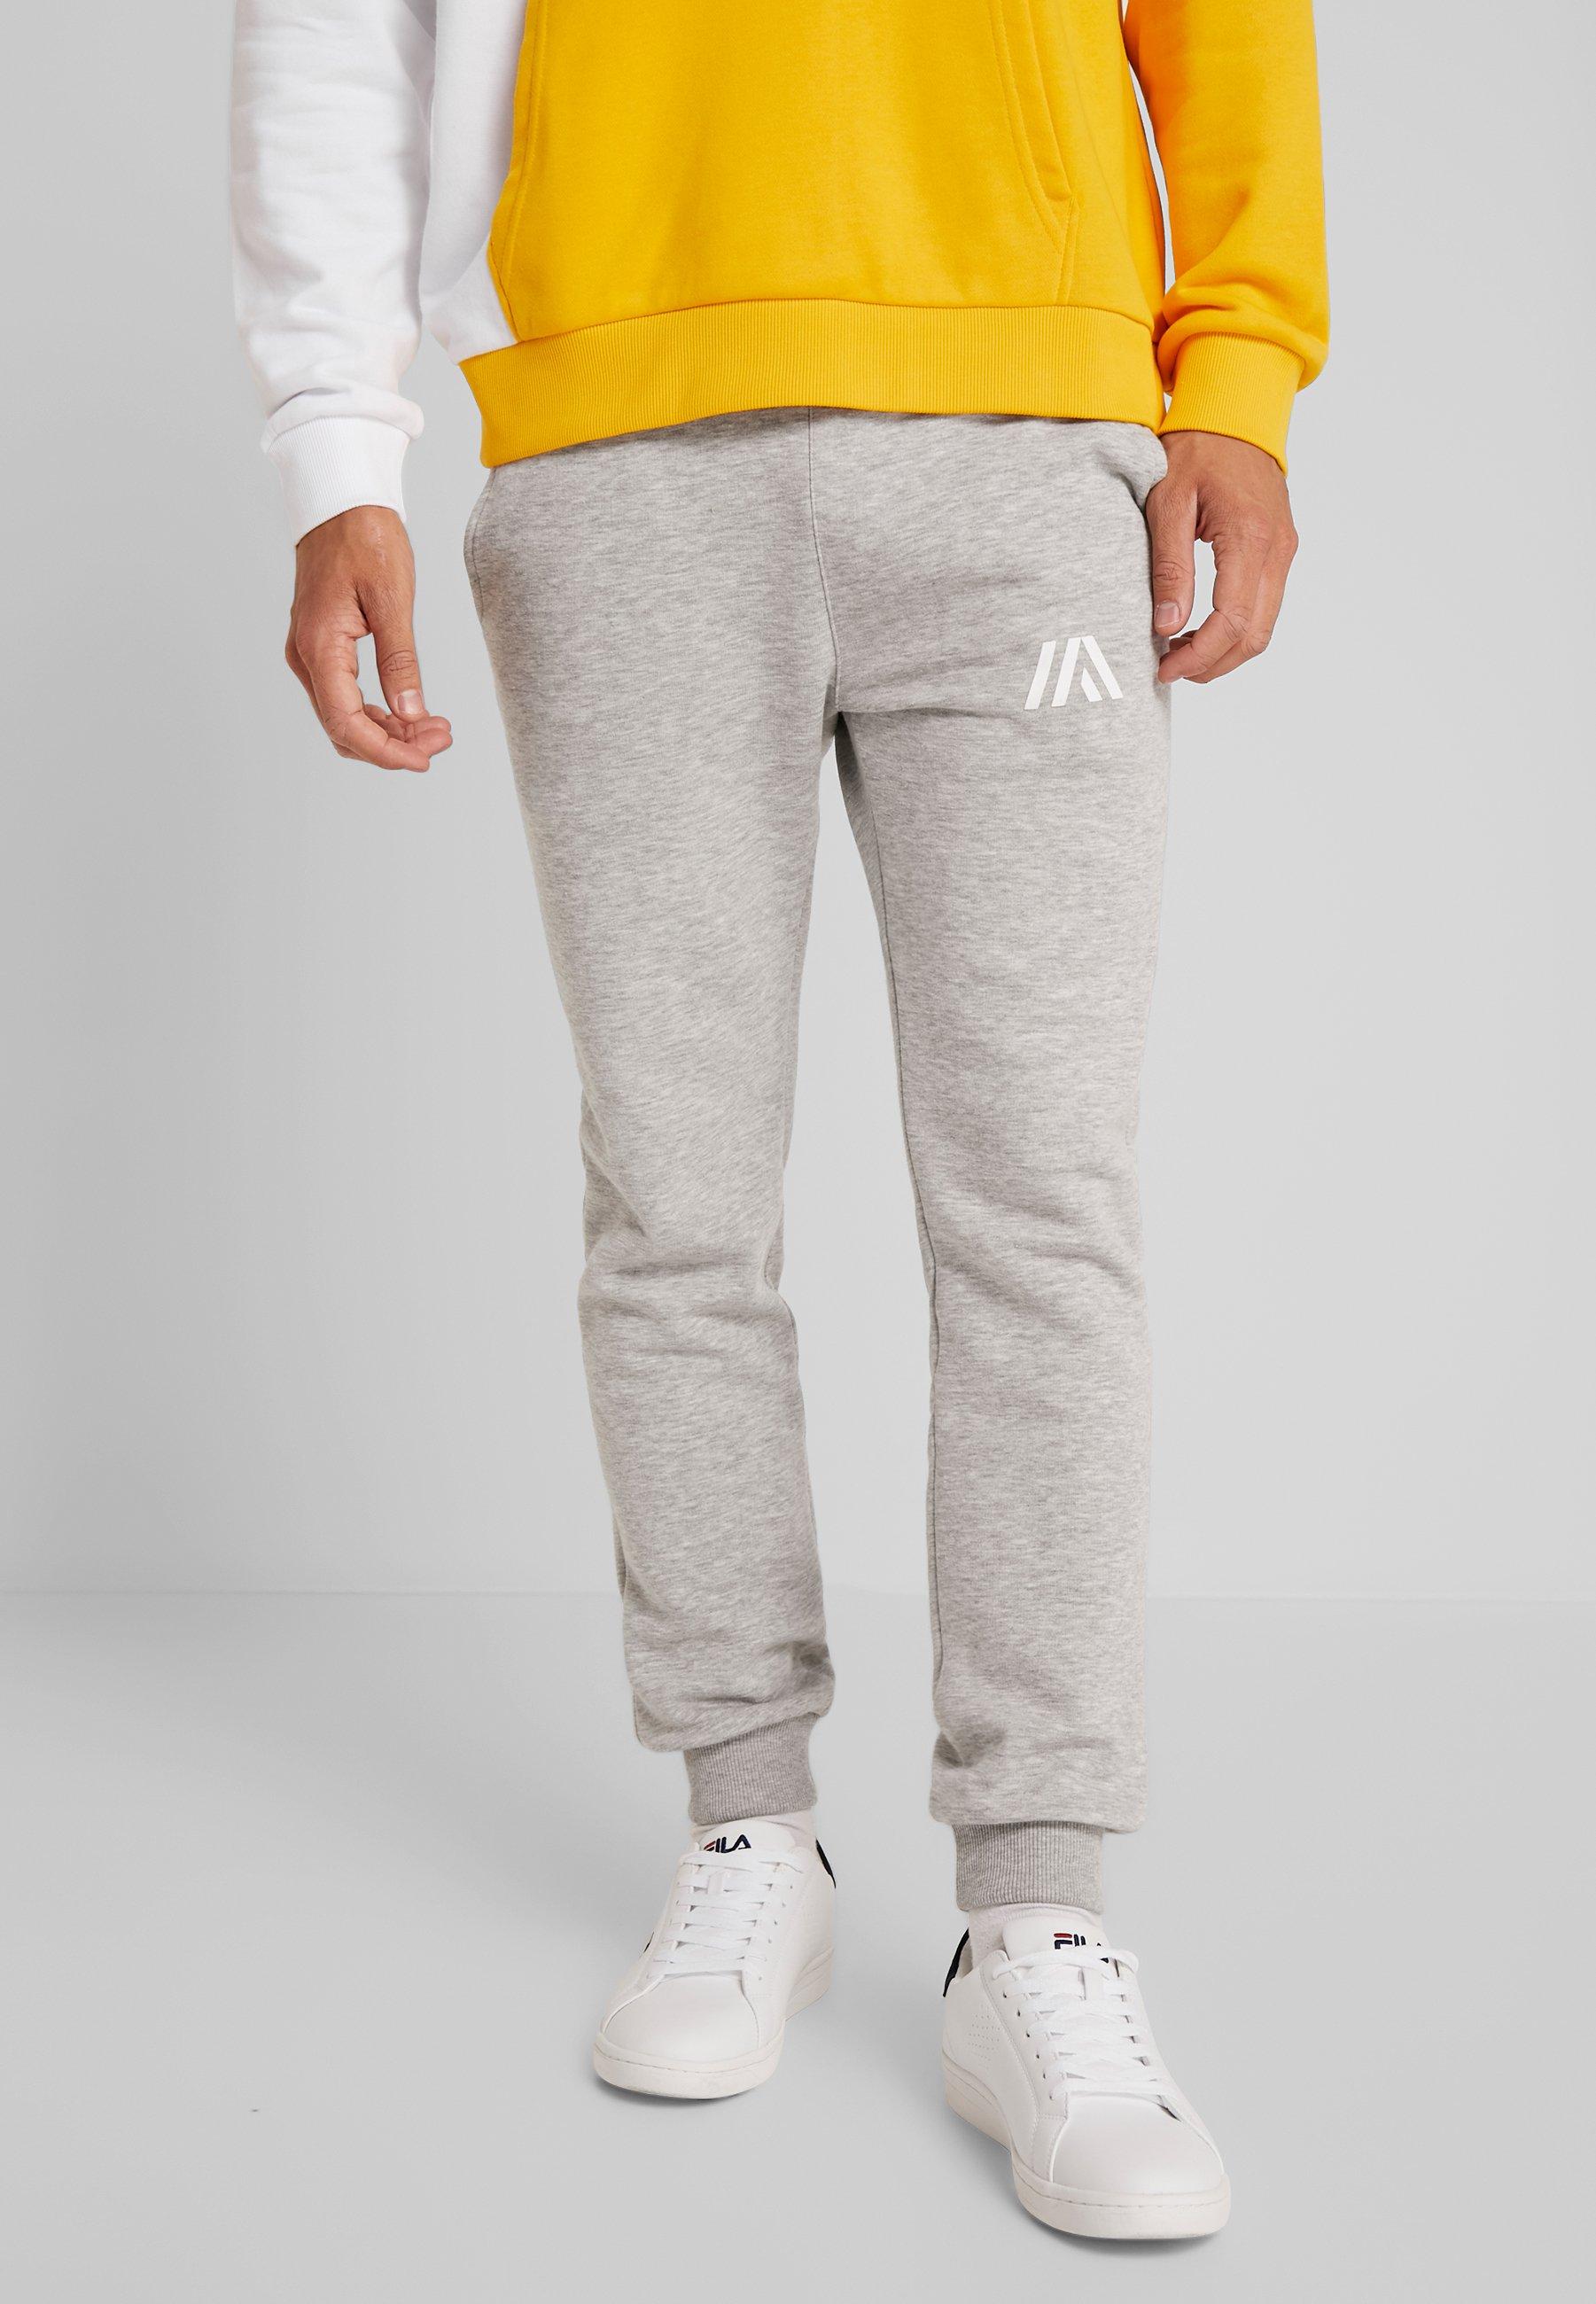 Grey Turn Active Pantalon SurvêtementMottled Your De WEH2DIY9